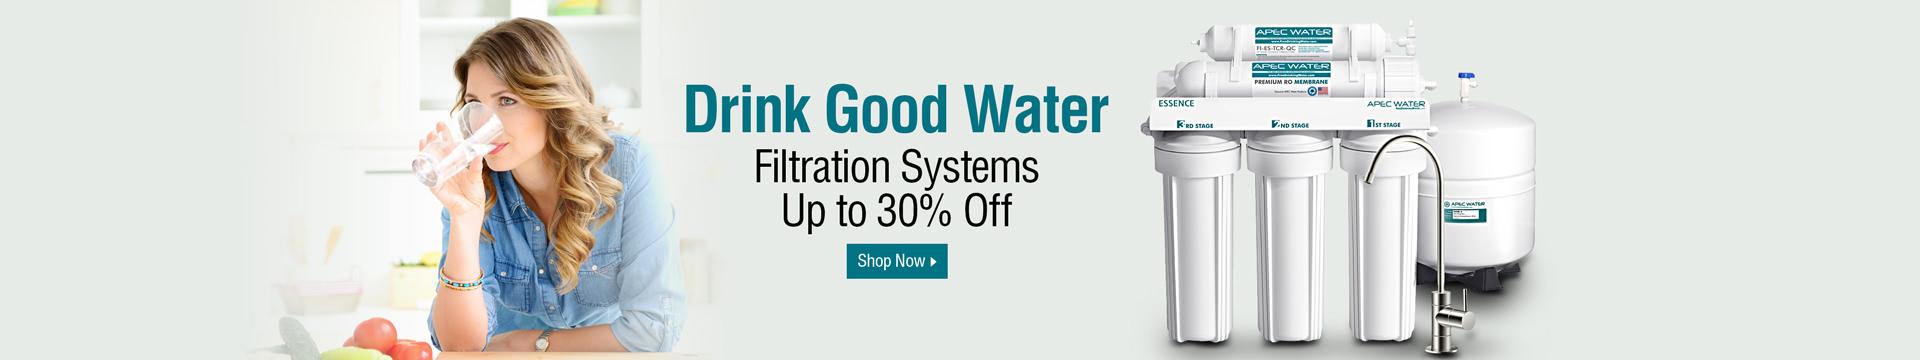 Drink good water